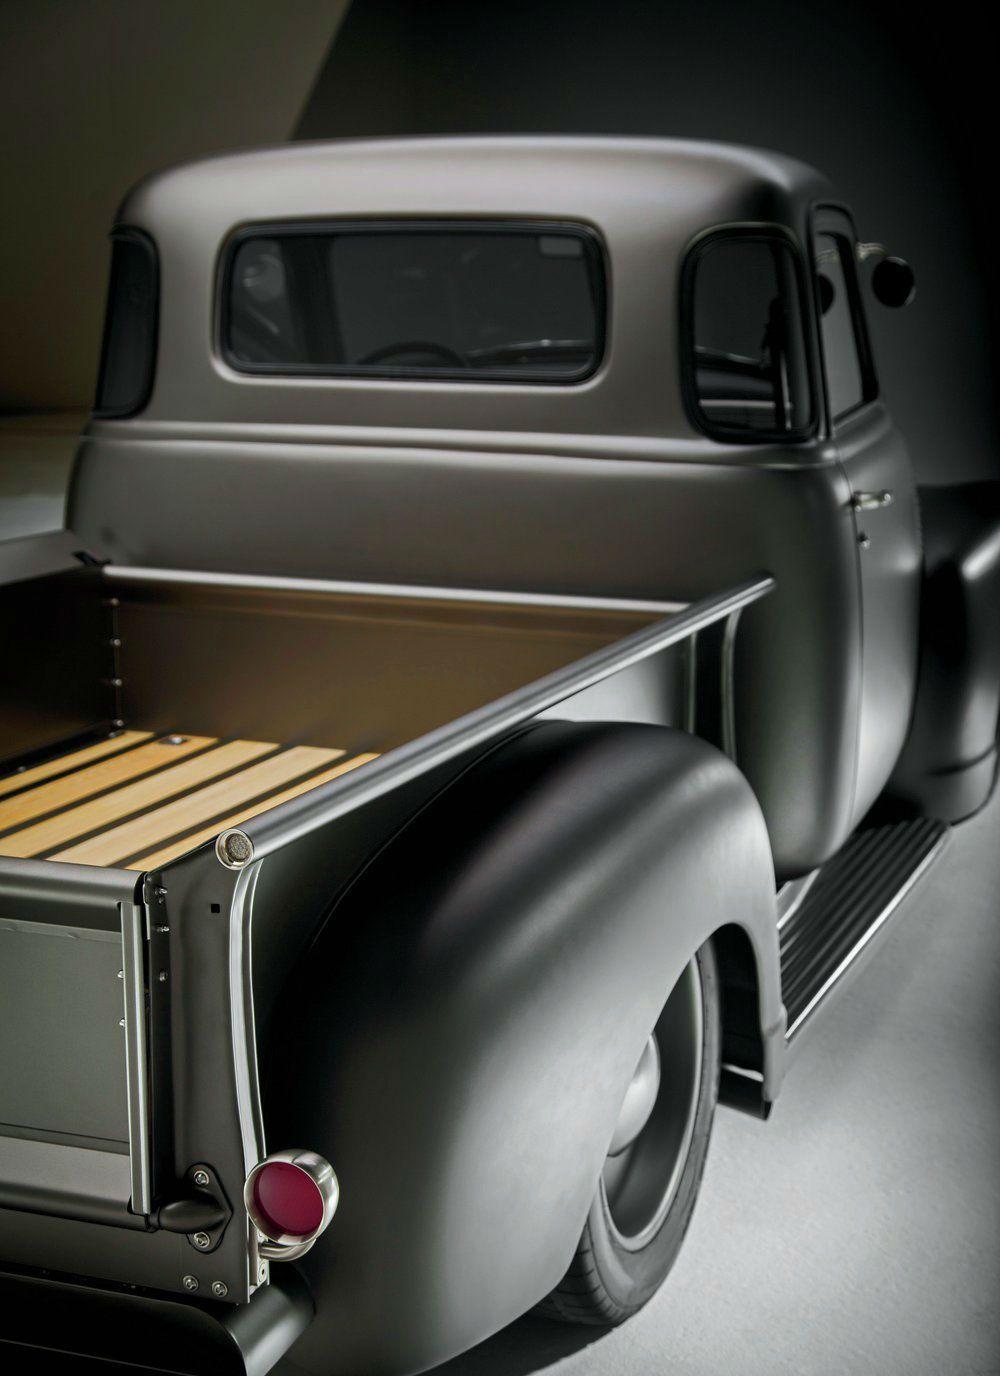 Pickup 48 chevy pickup parts : 1950-chevy-pickup-rear-profile...restomod | Tristan's board 6 ...